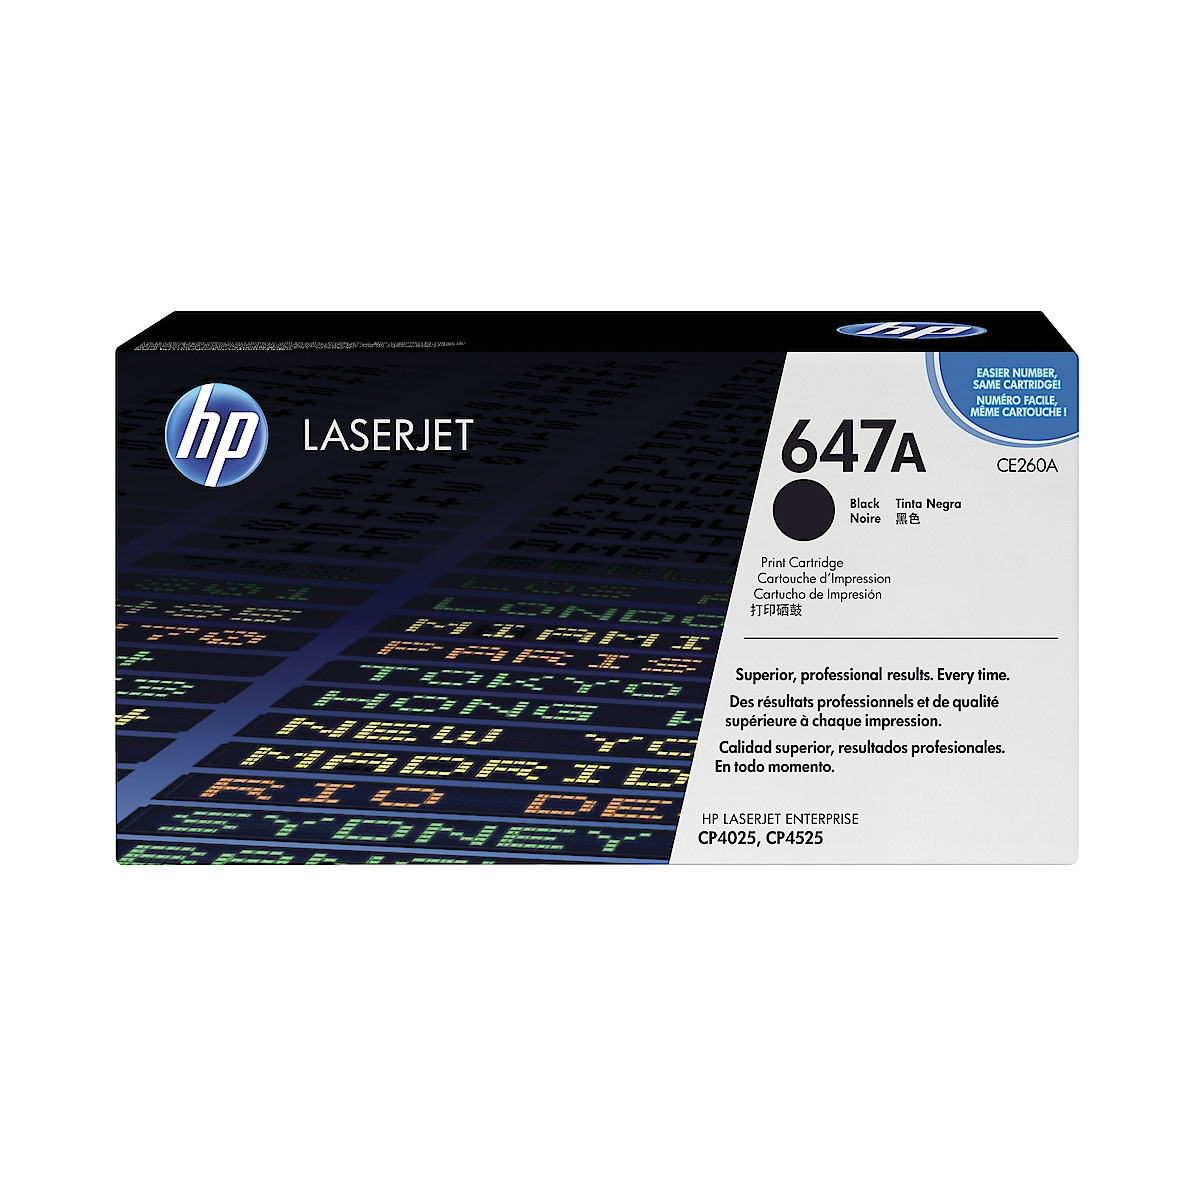 Toner for laserskrivere HP CE260A